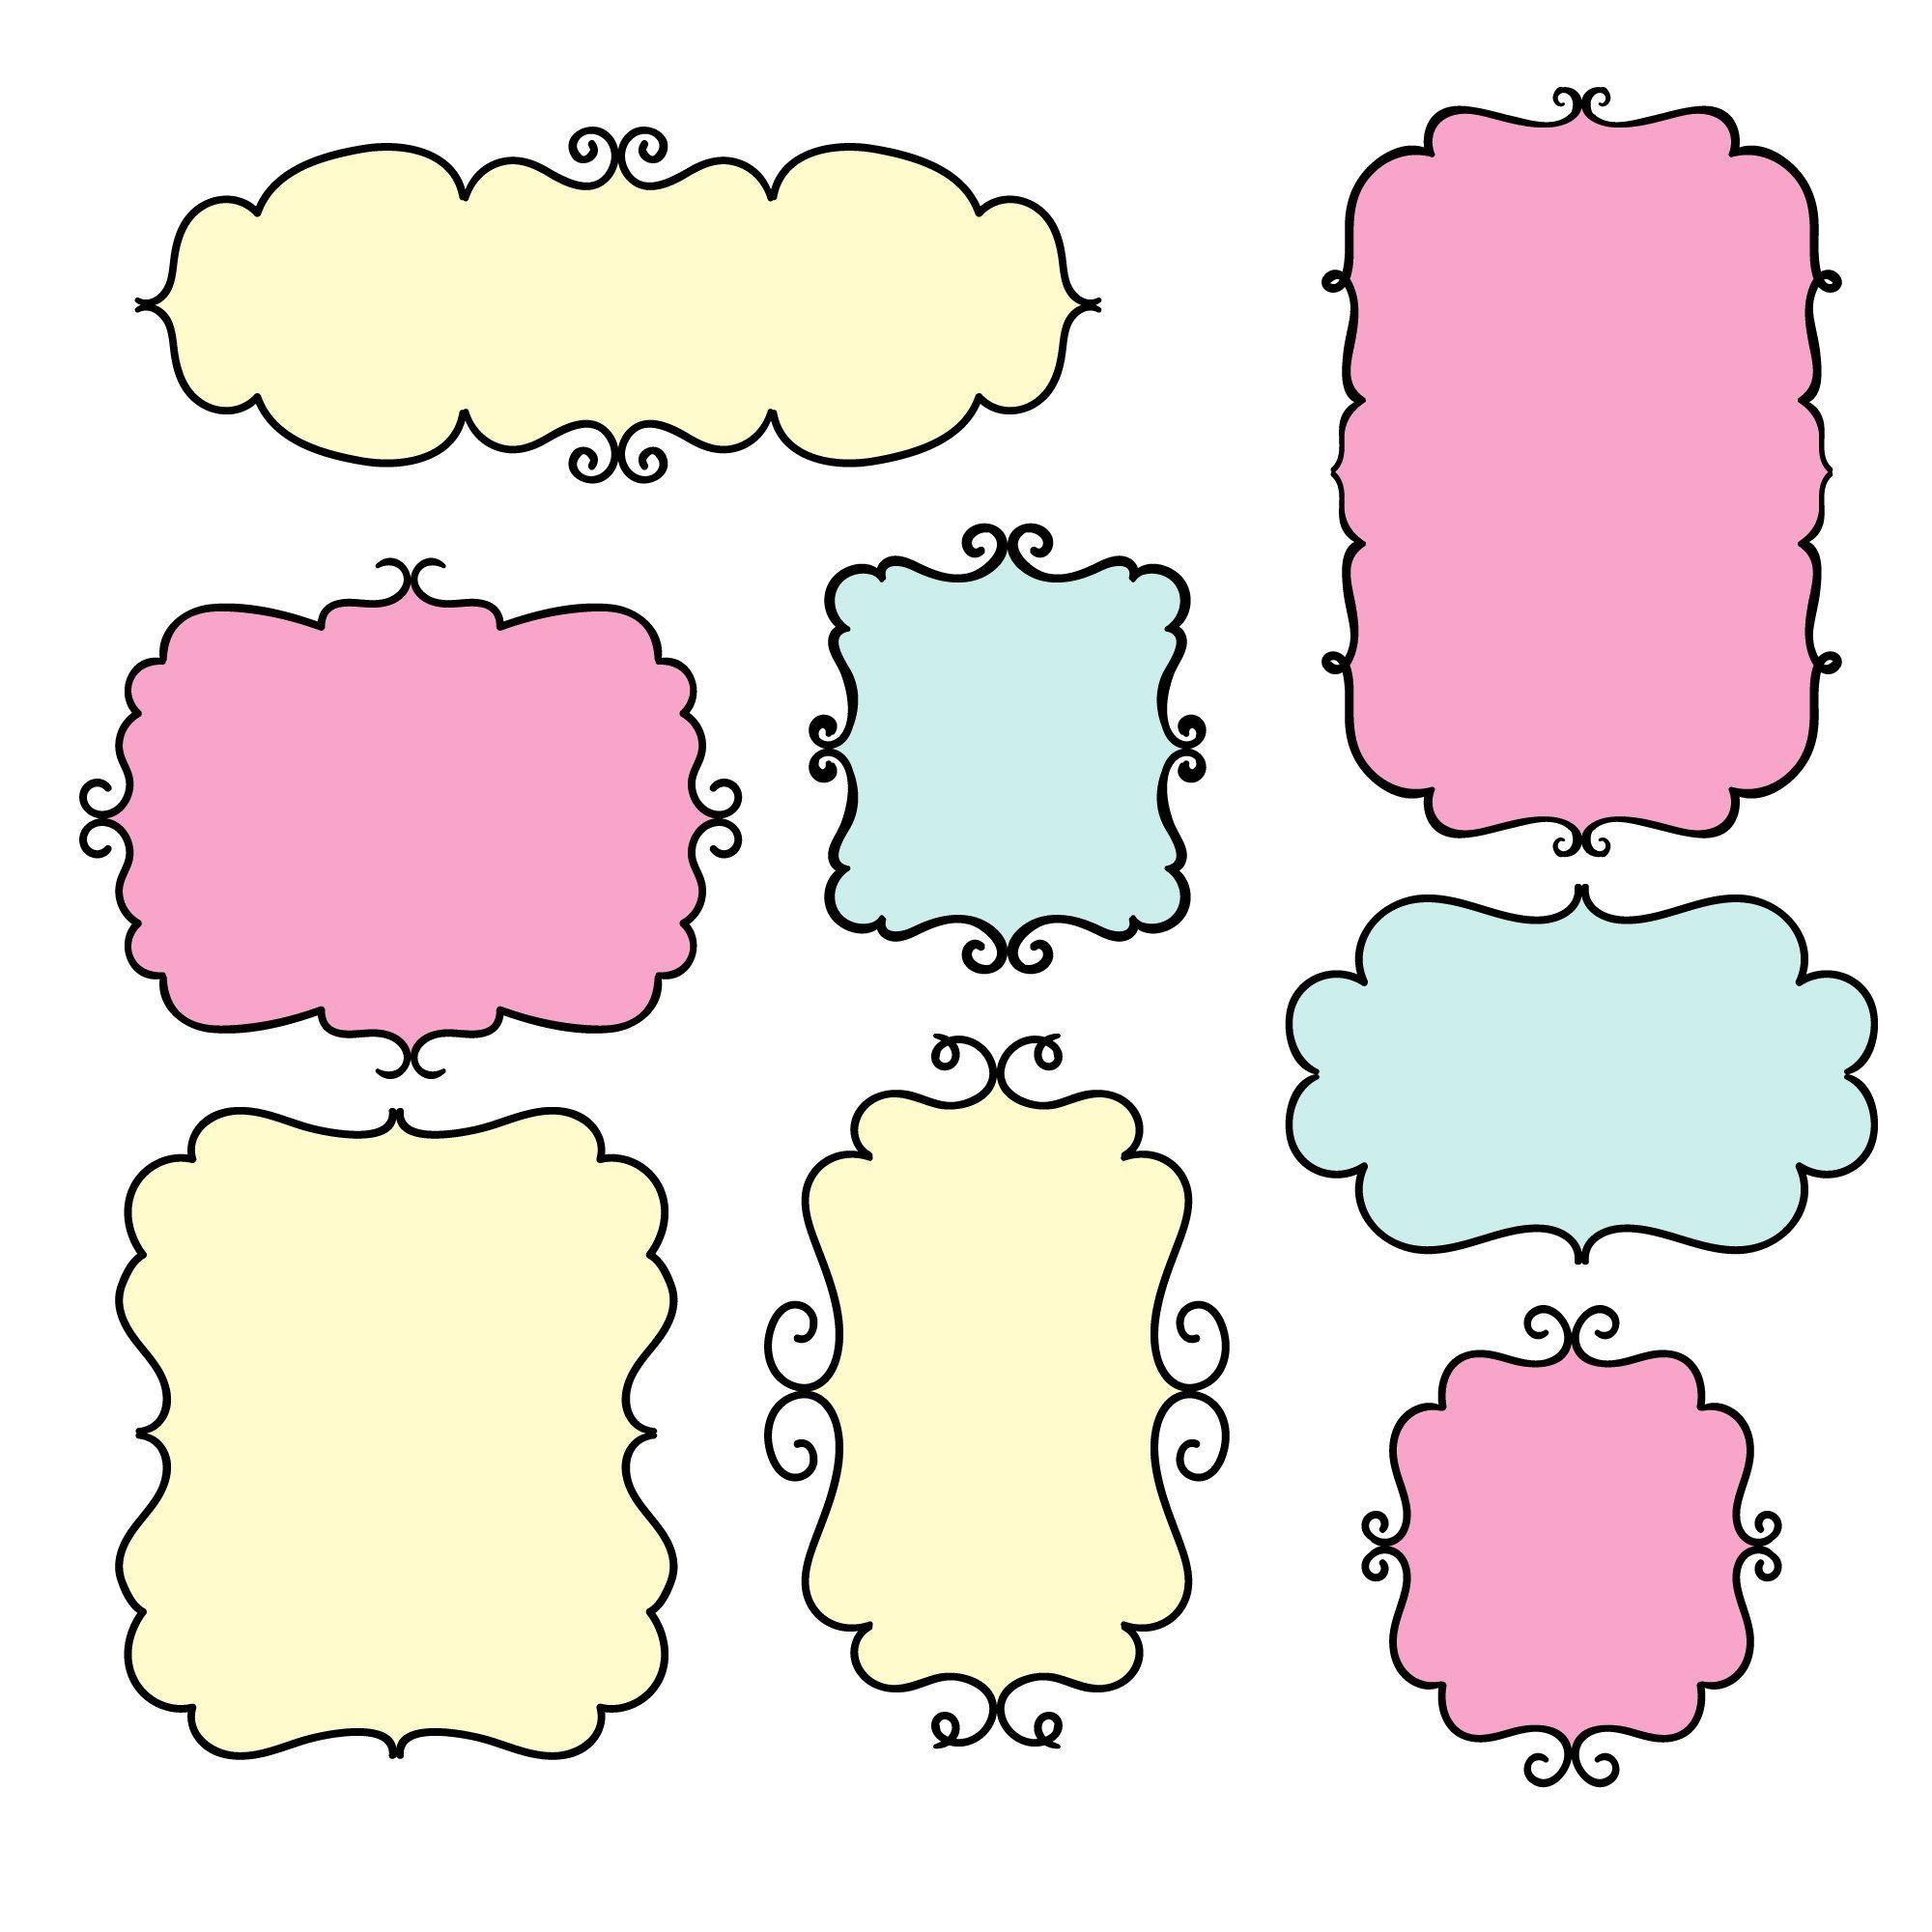 Скрапбукинг шаблоны, открытки для